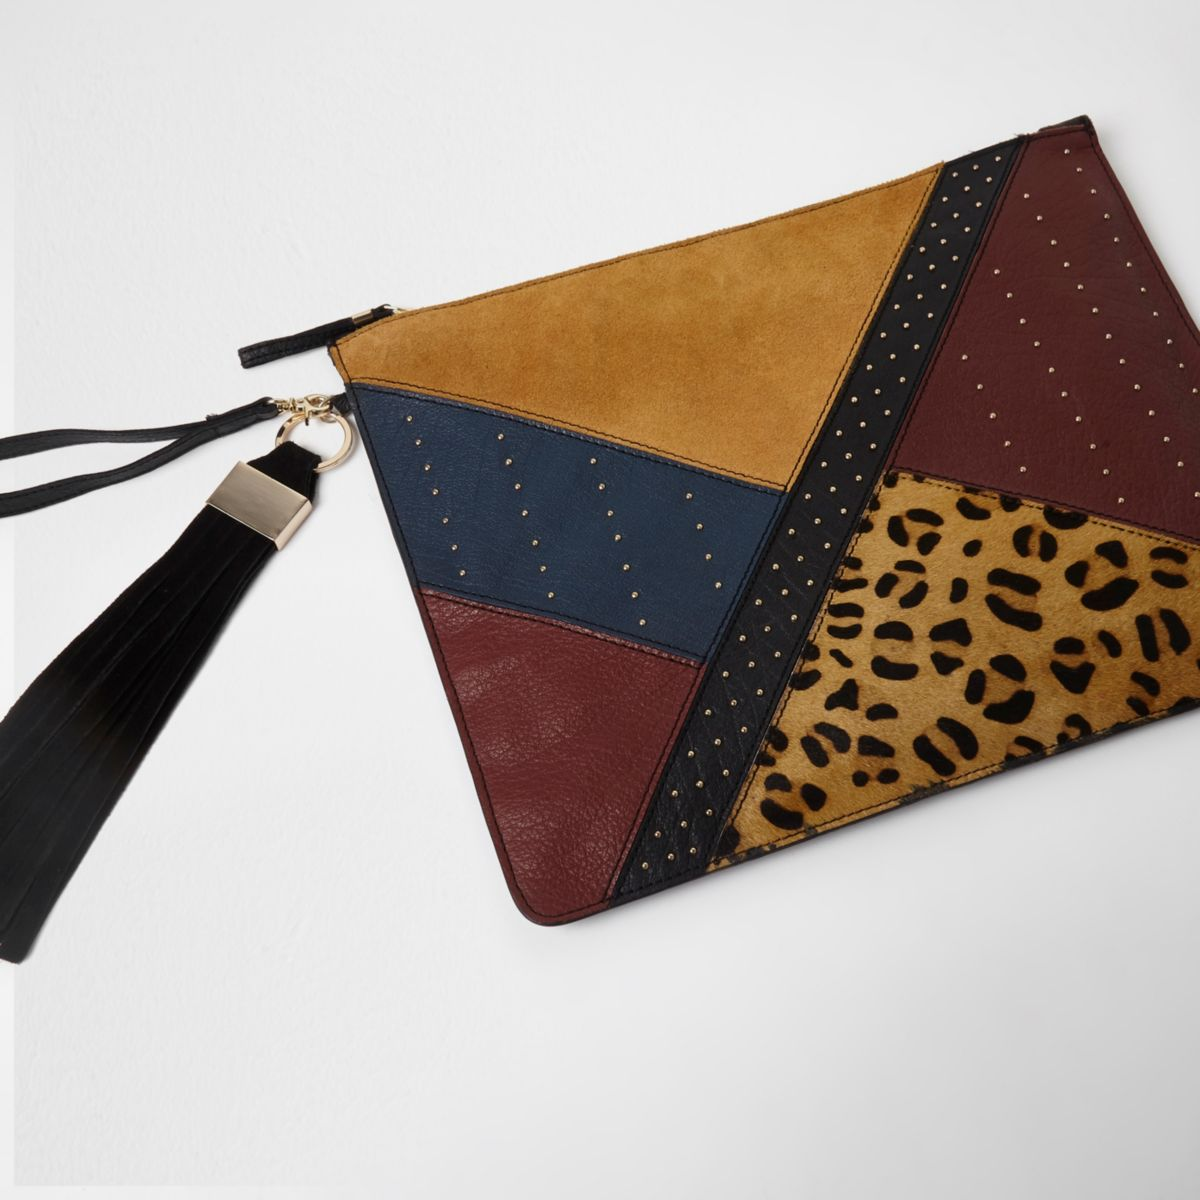 Beige leather patchwork stud large clutch bag